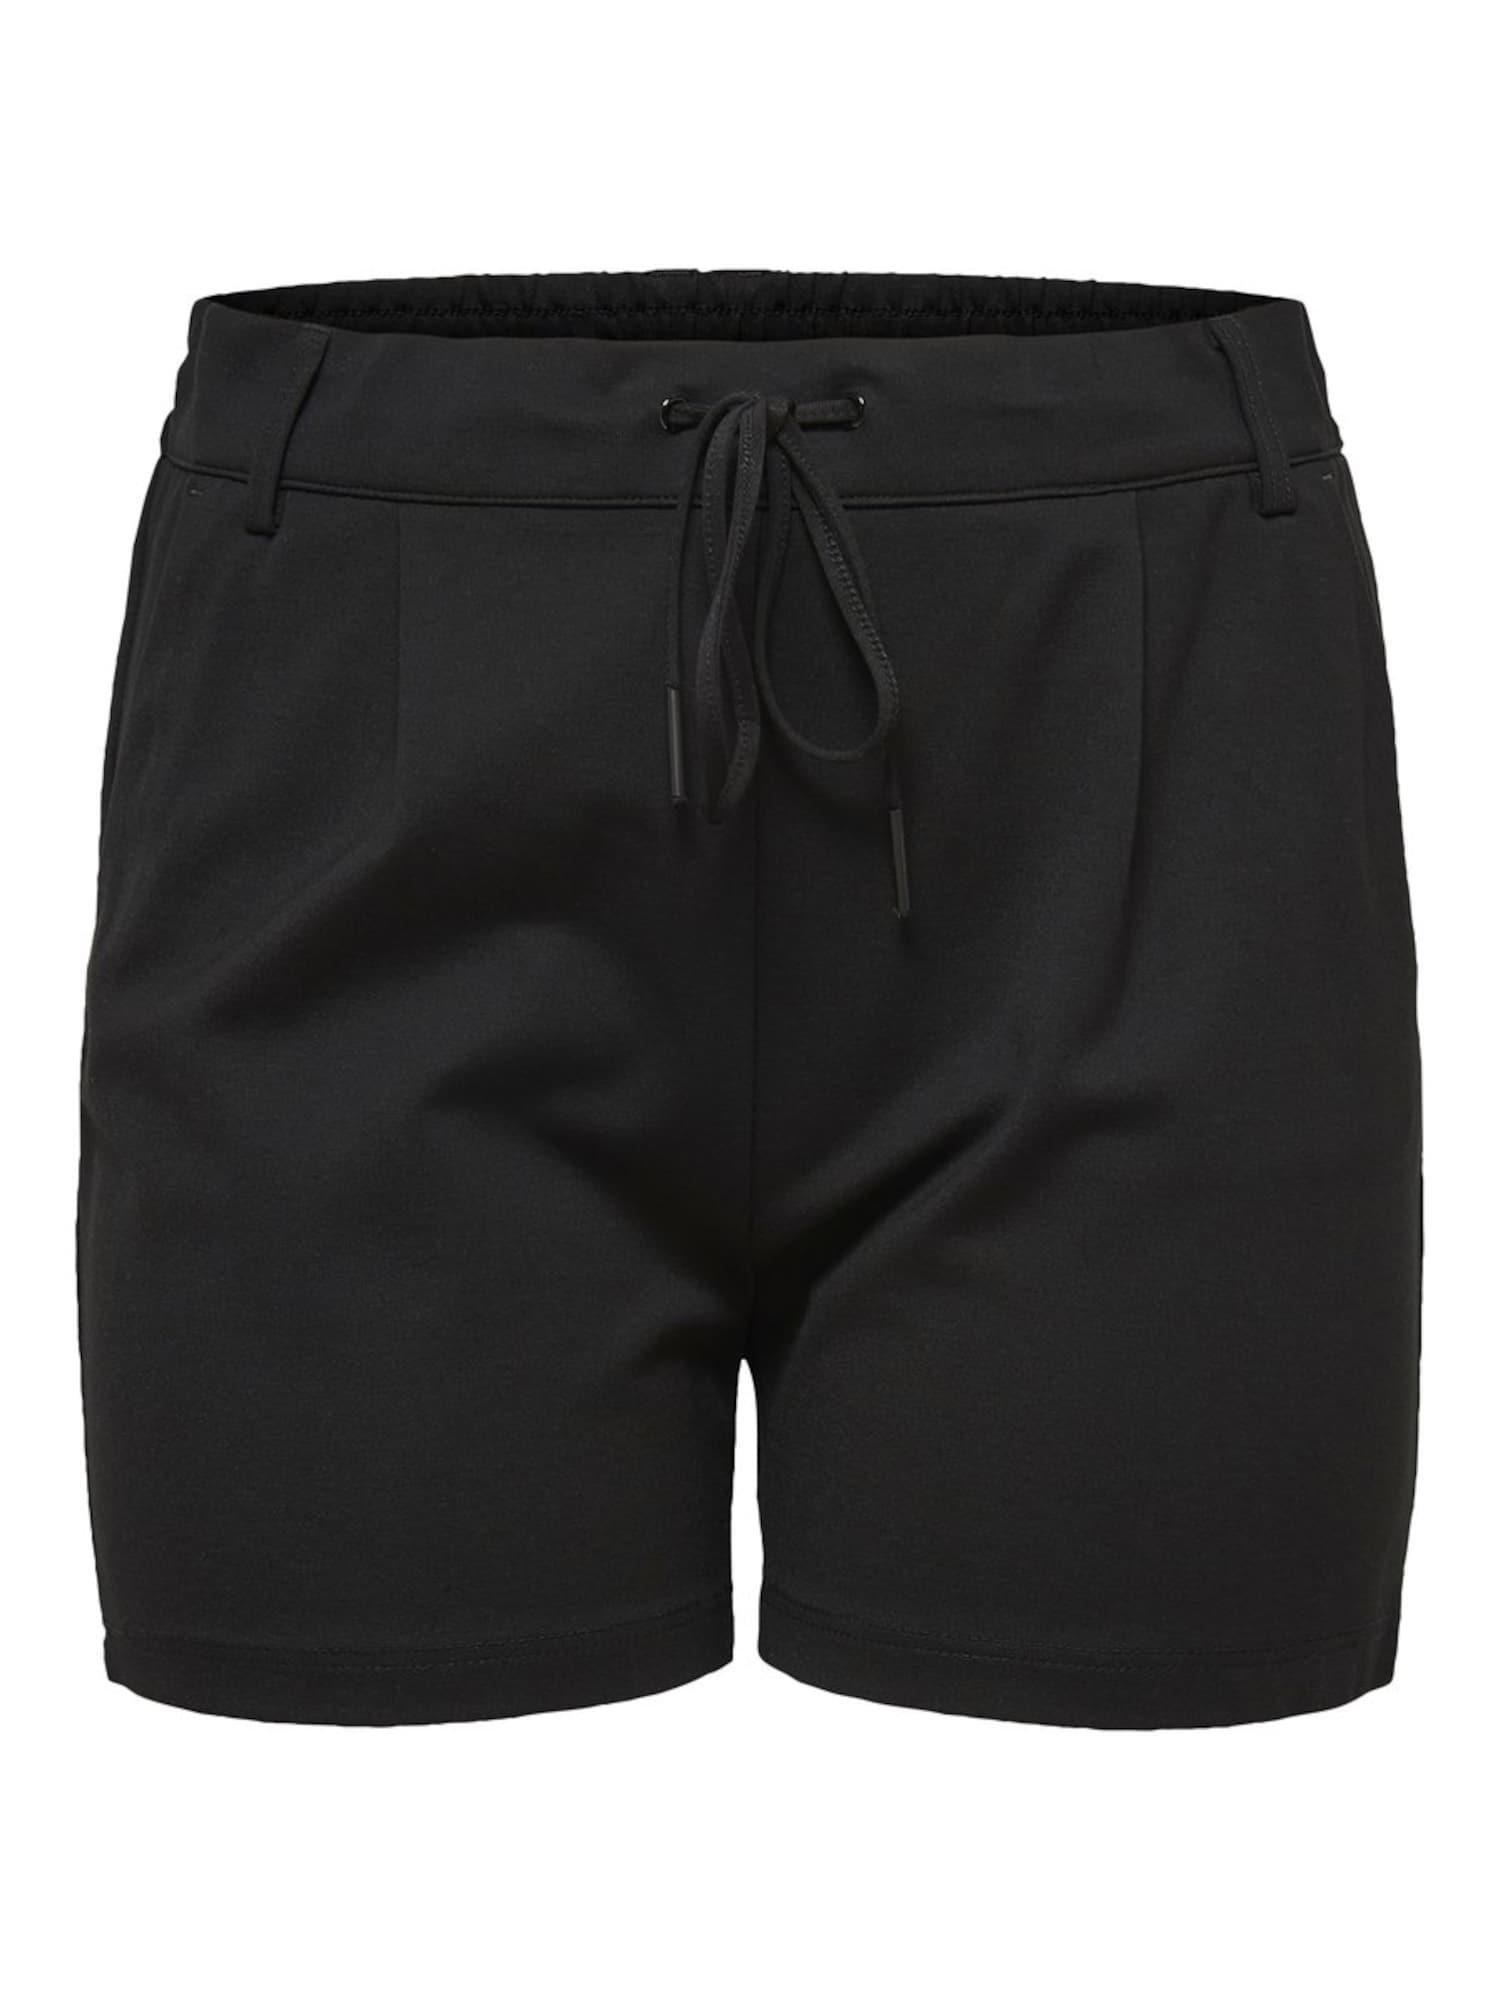 ONLY Carmakoma Kelnės 'Cargoldtrash Easy' juoda